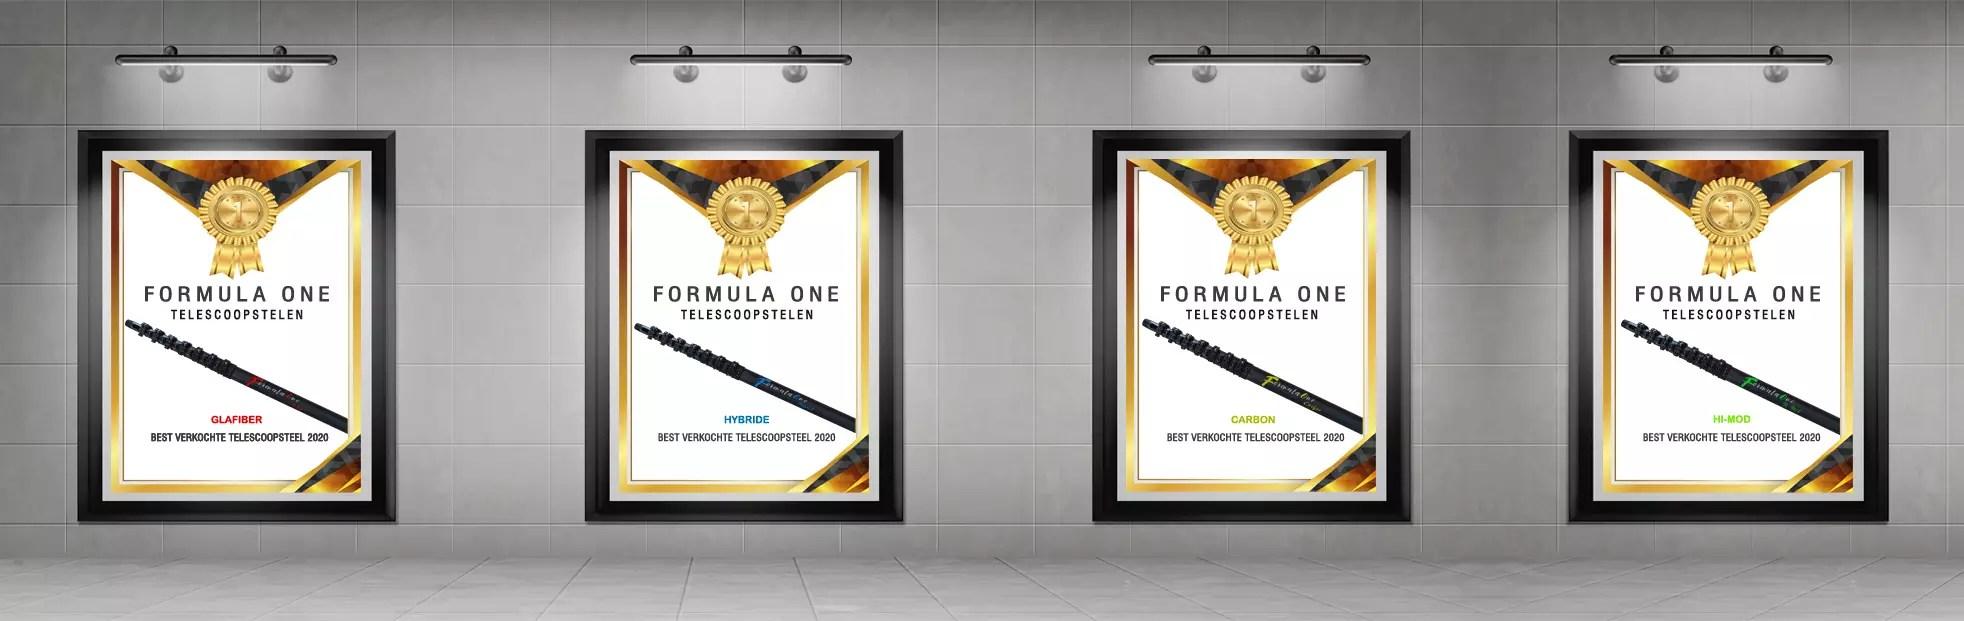 Formula One Wall Fame Telewashwinkel